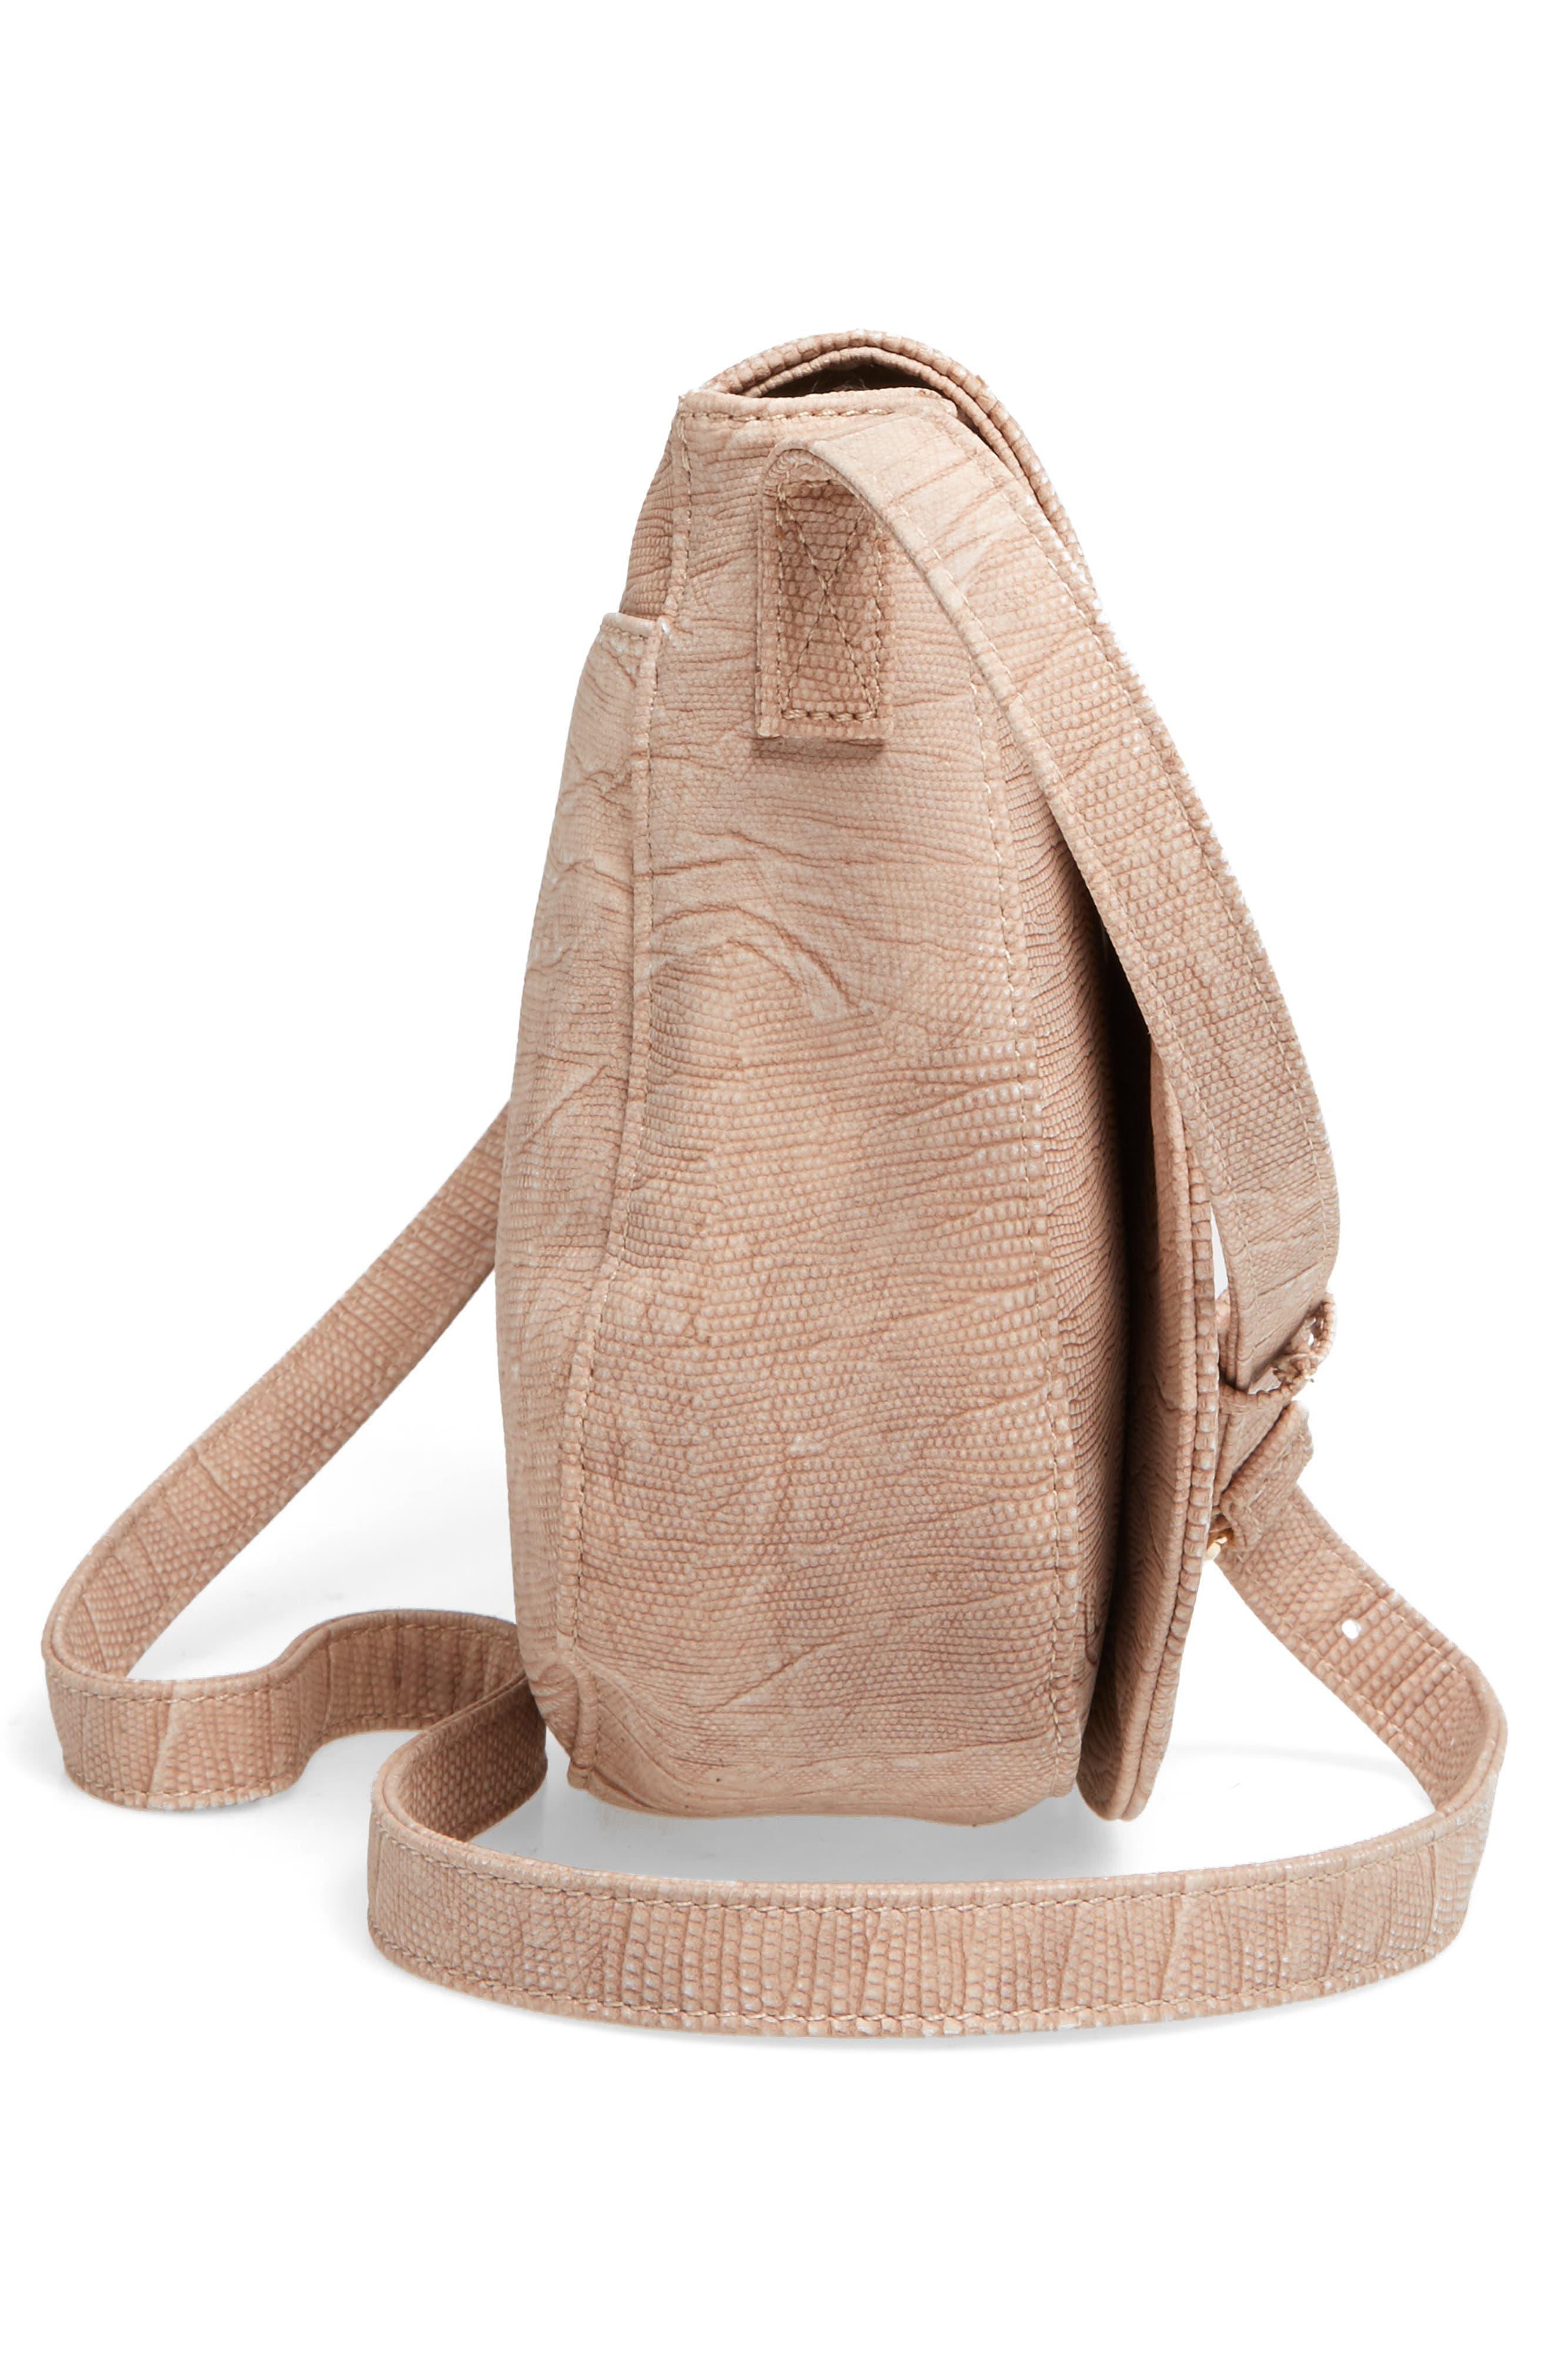 Livvy Faux Leather Crossbody Saddle Bag,                             Alternate thumbnail 14, color,